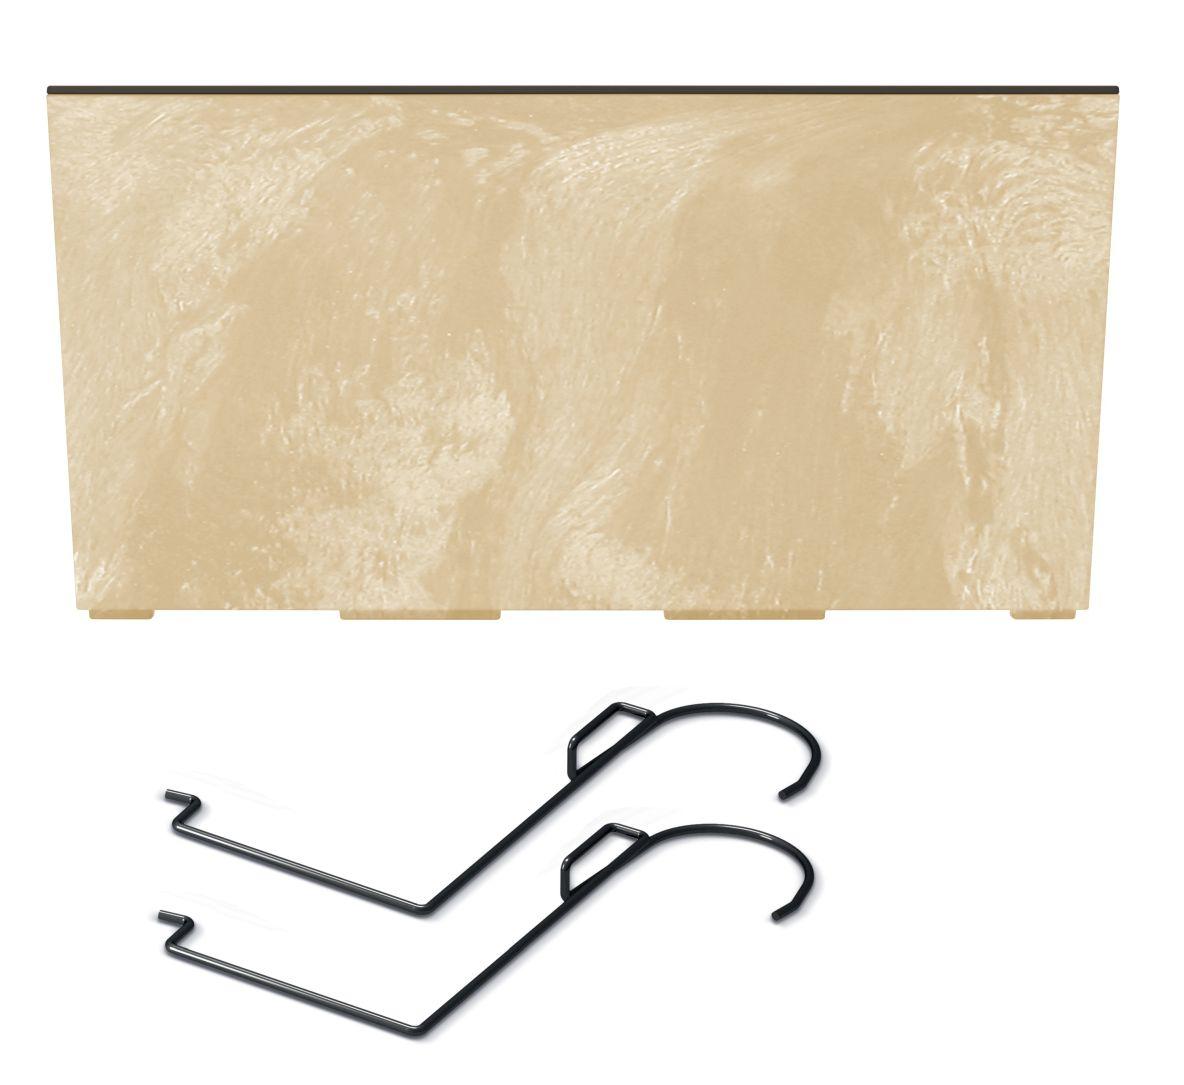 PROSPERPLAST Truhlík s háky URBI CASE BETON EFFECT W pískový 58cm